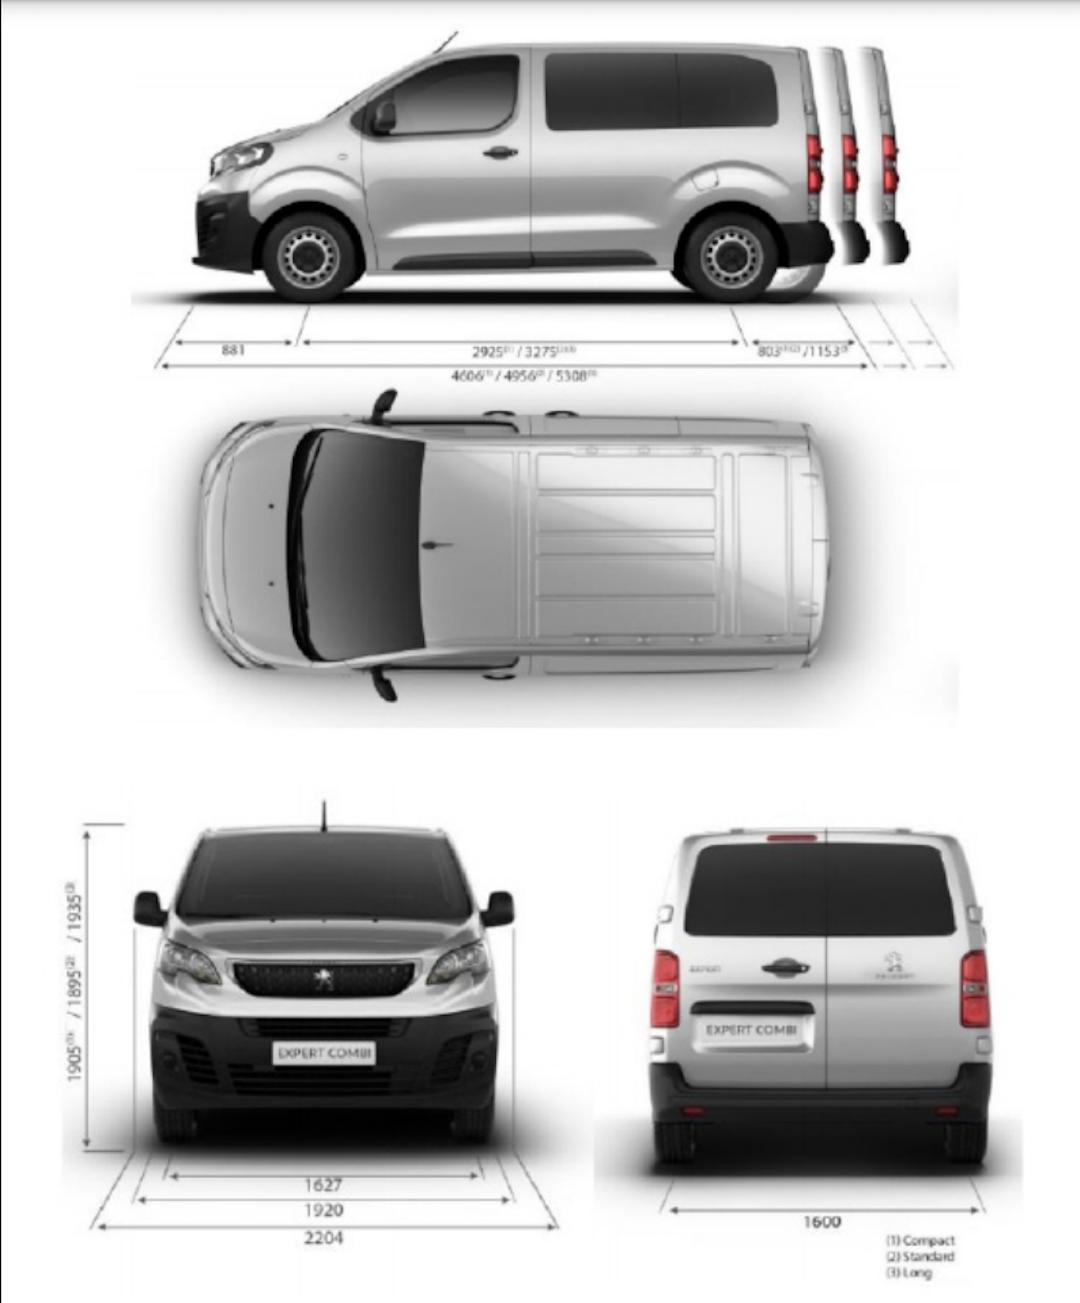 dimensões do Peugeot Expert Combi